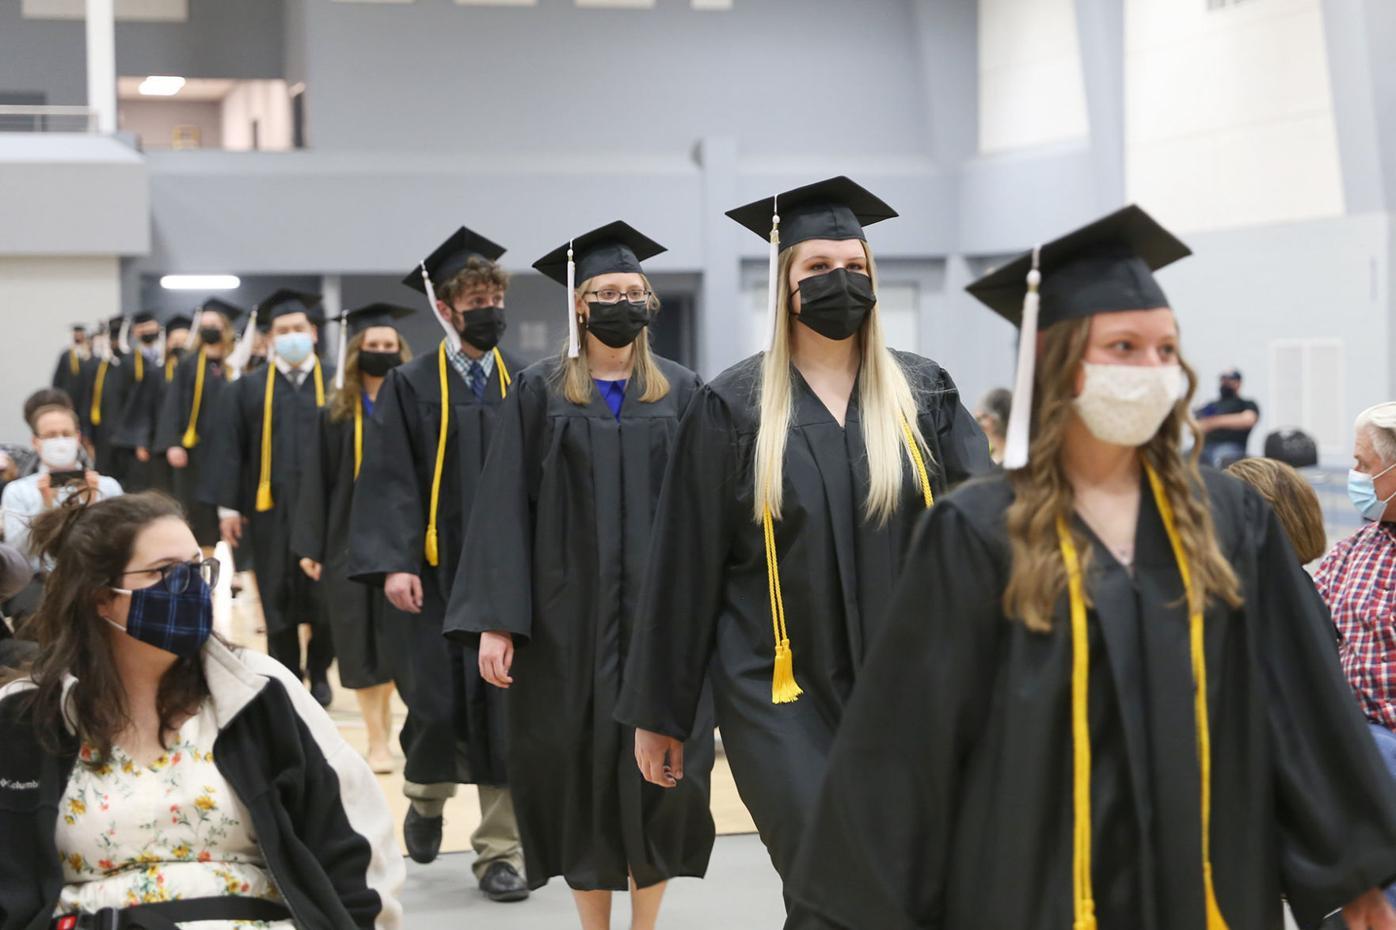 Clarks Summit University holds graduation ceremonies